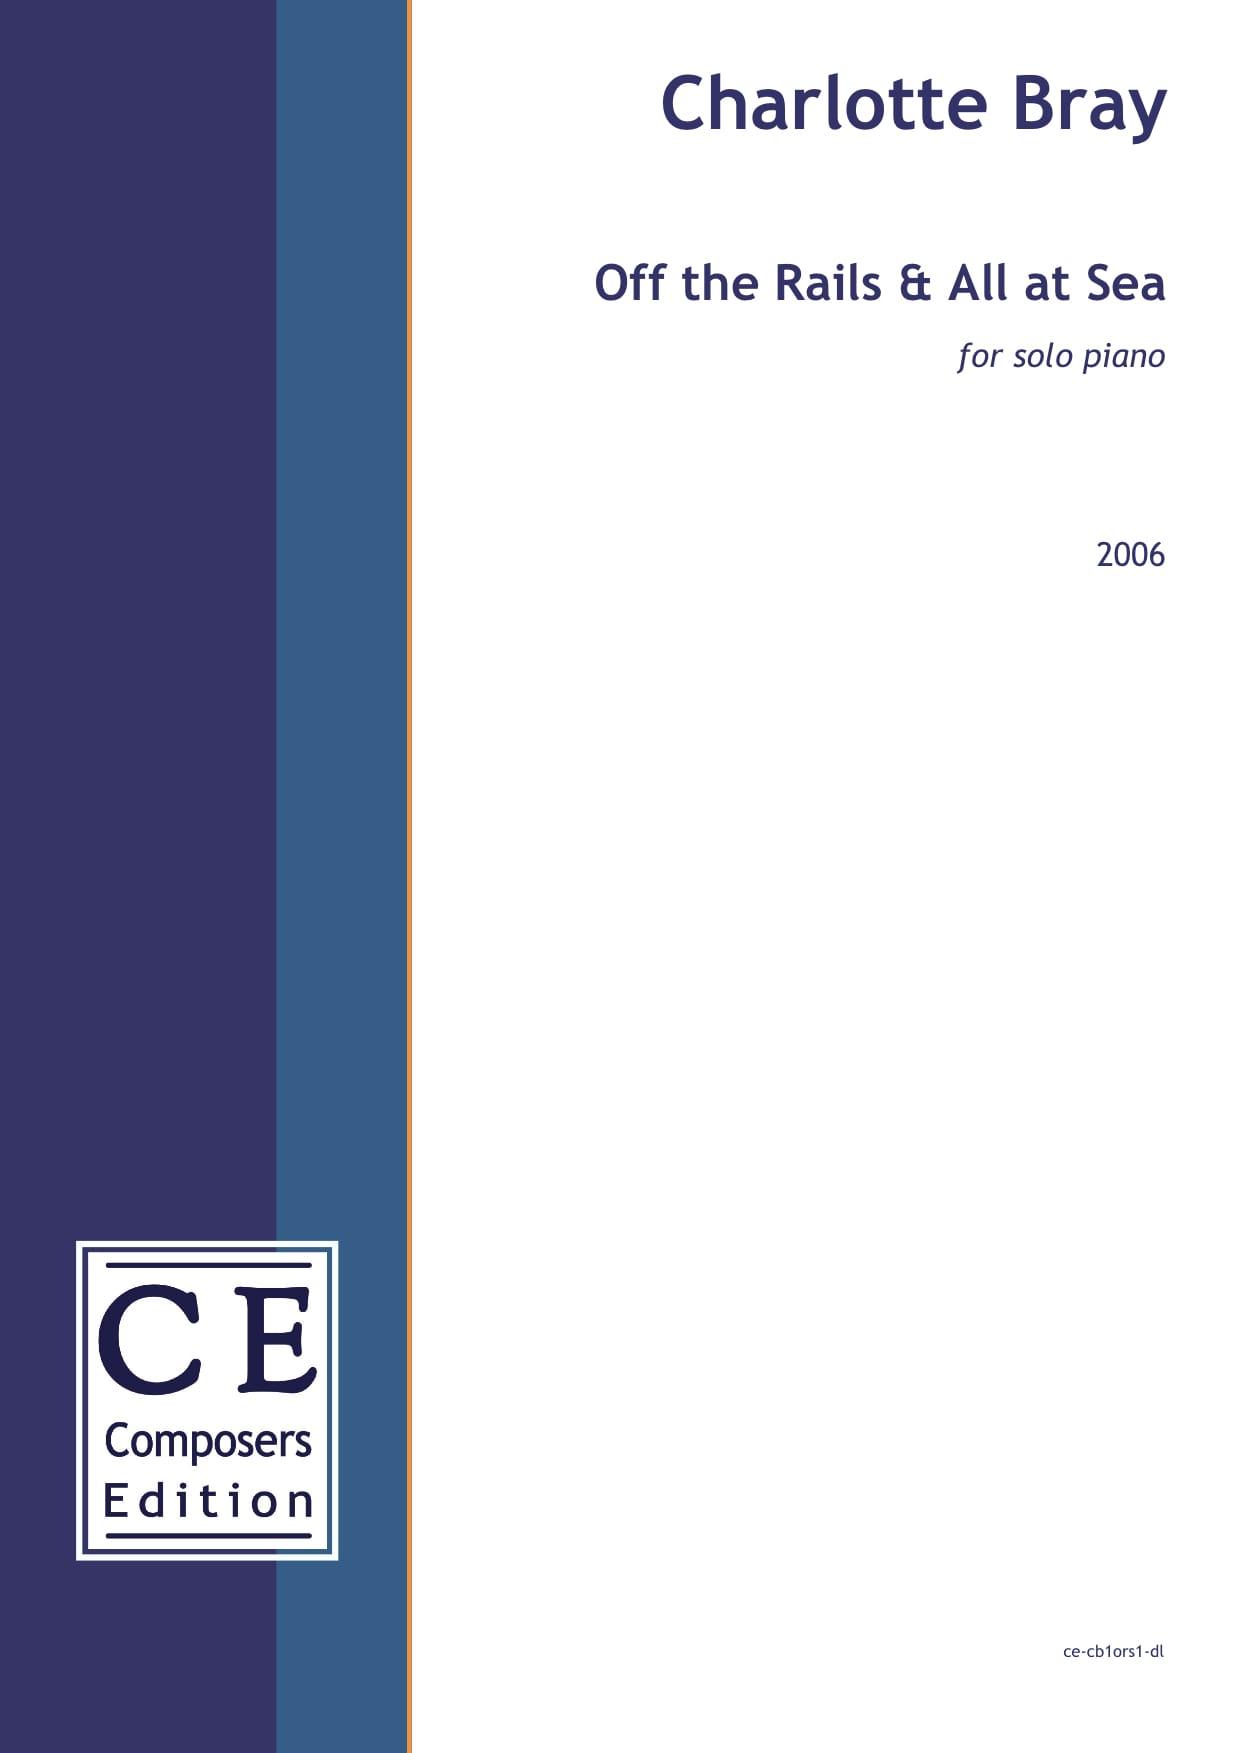 Charlotte Bray: Off the Rails & All at Sea for solo piano